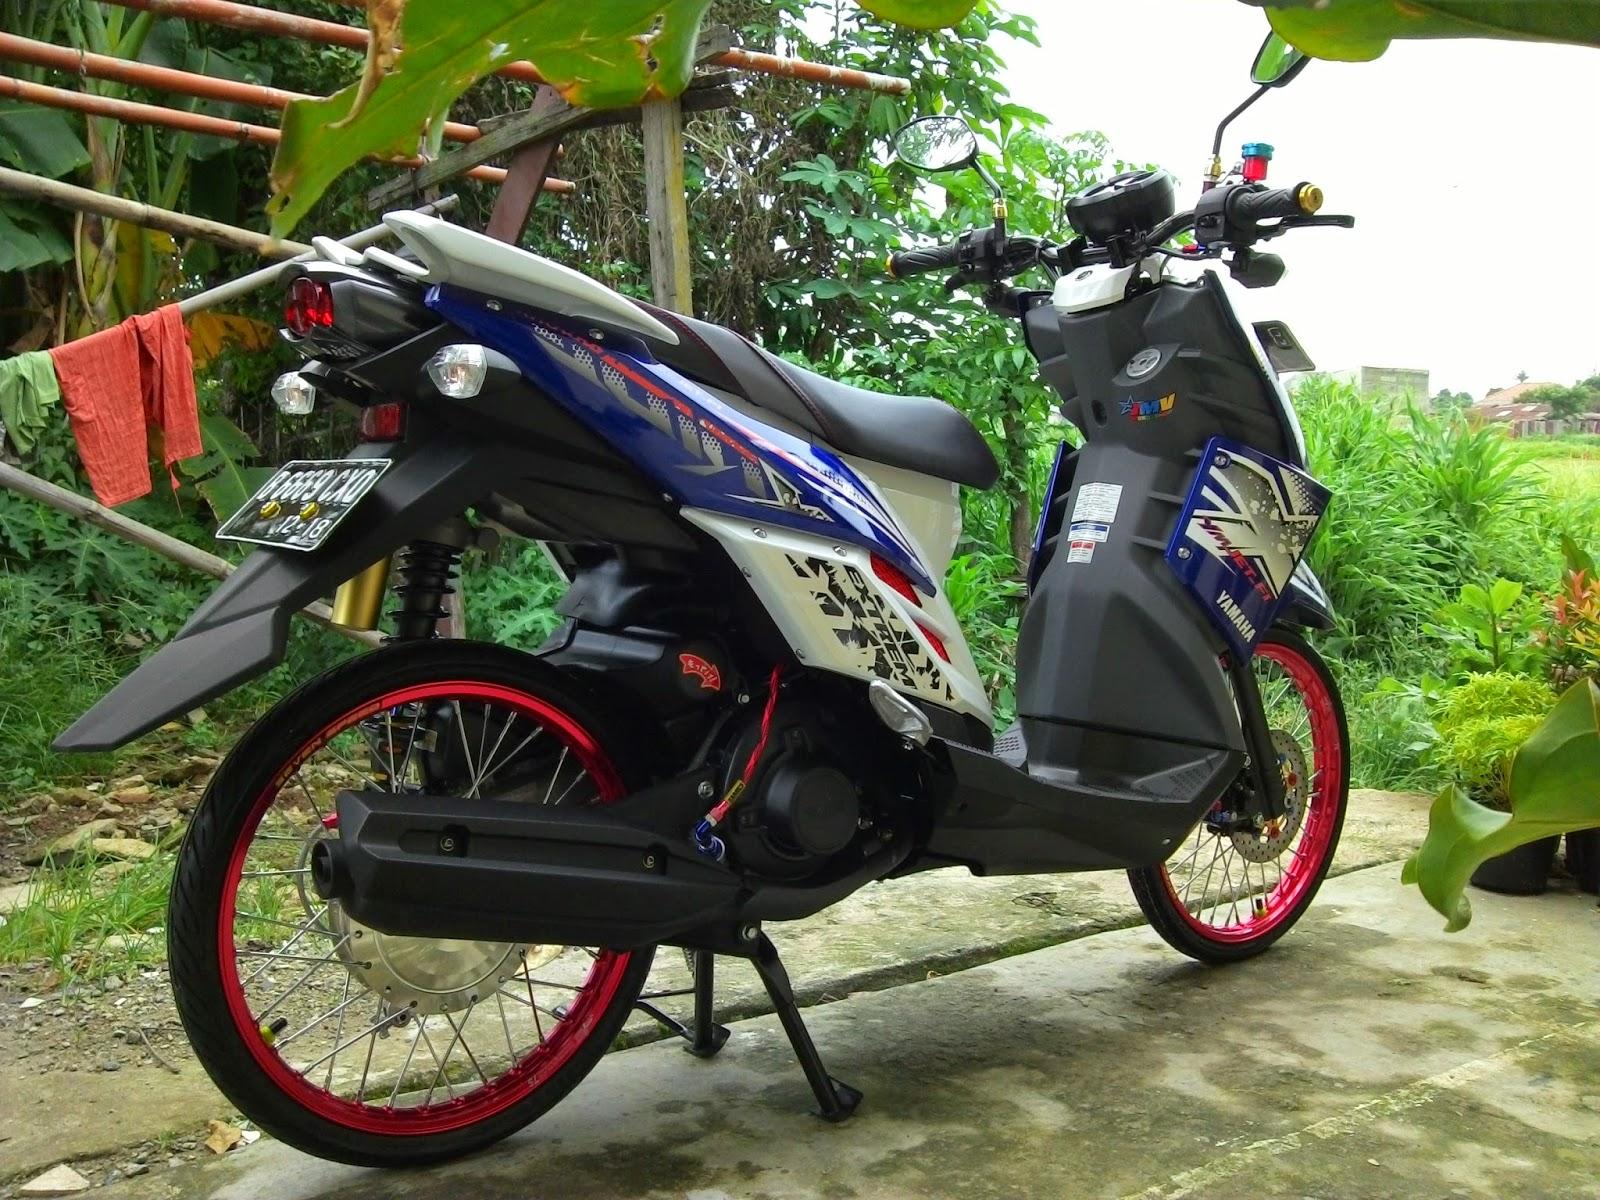 Modifikasi X Ride Jadi Supermoto Motor Yamaha Terbaru Galeri Gambar